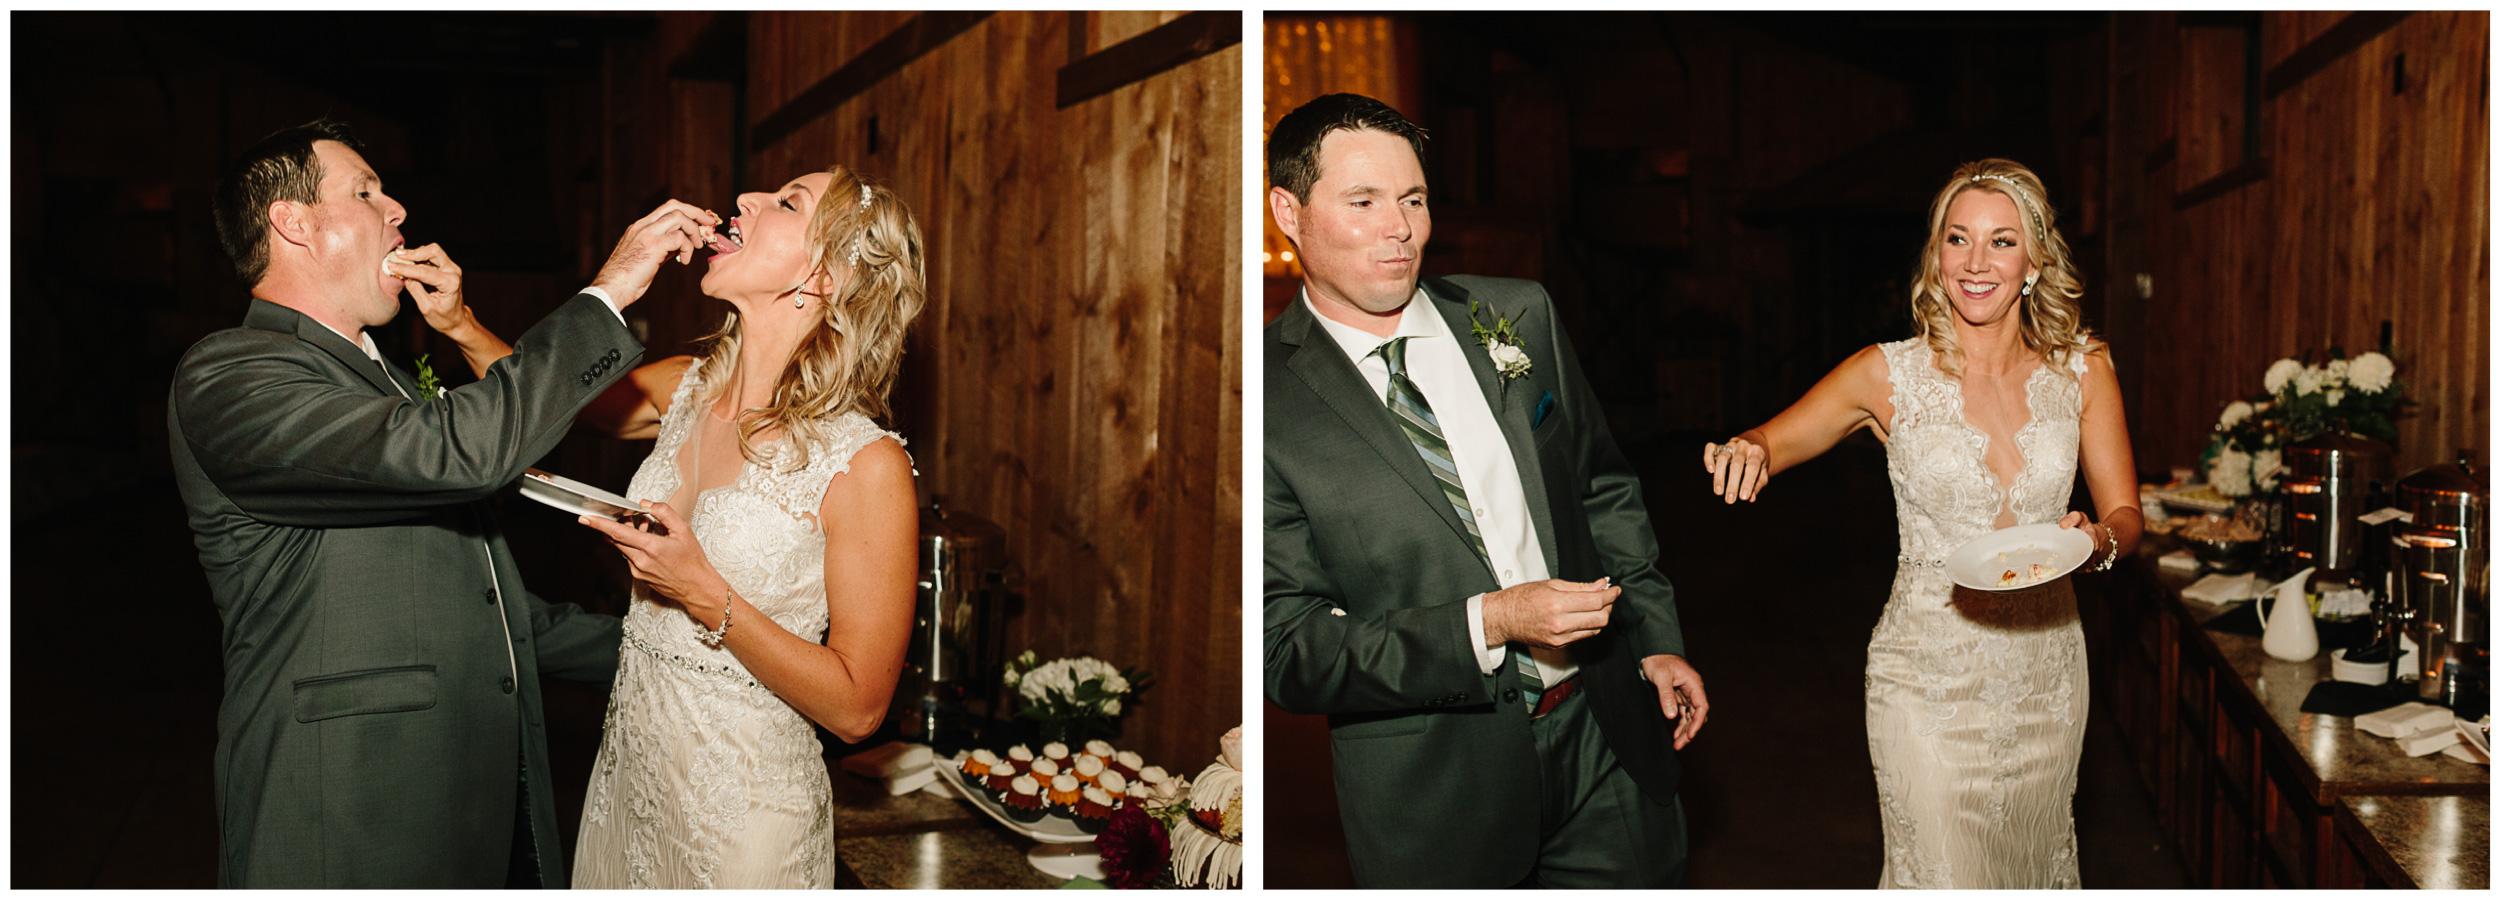 spruce_mountain_ranch_wedding_73.jpg